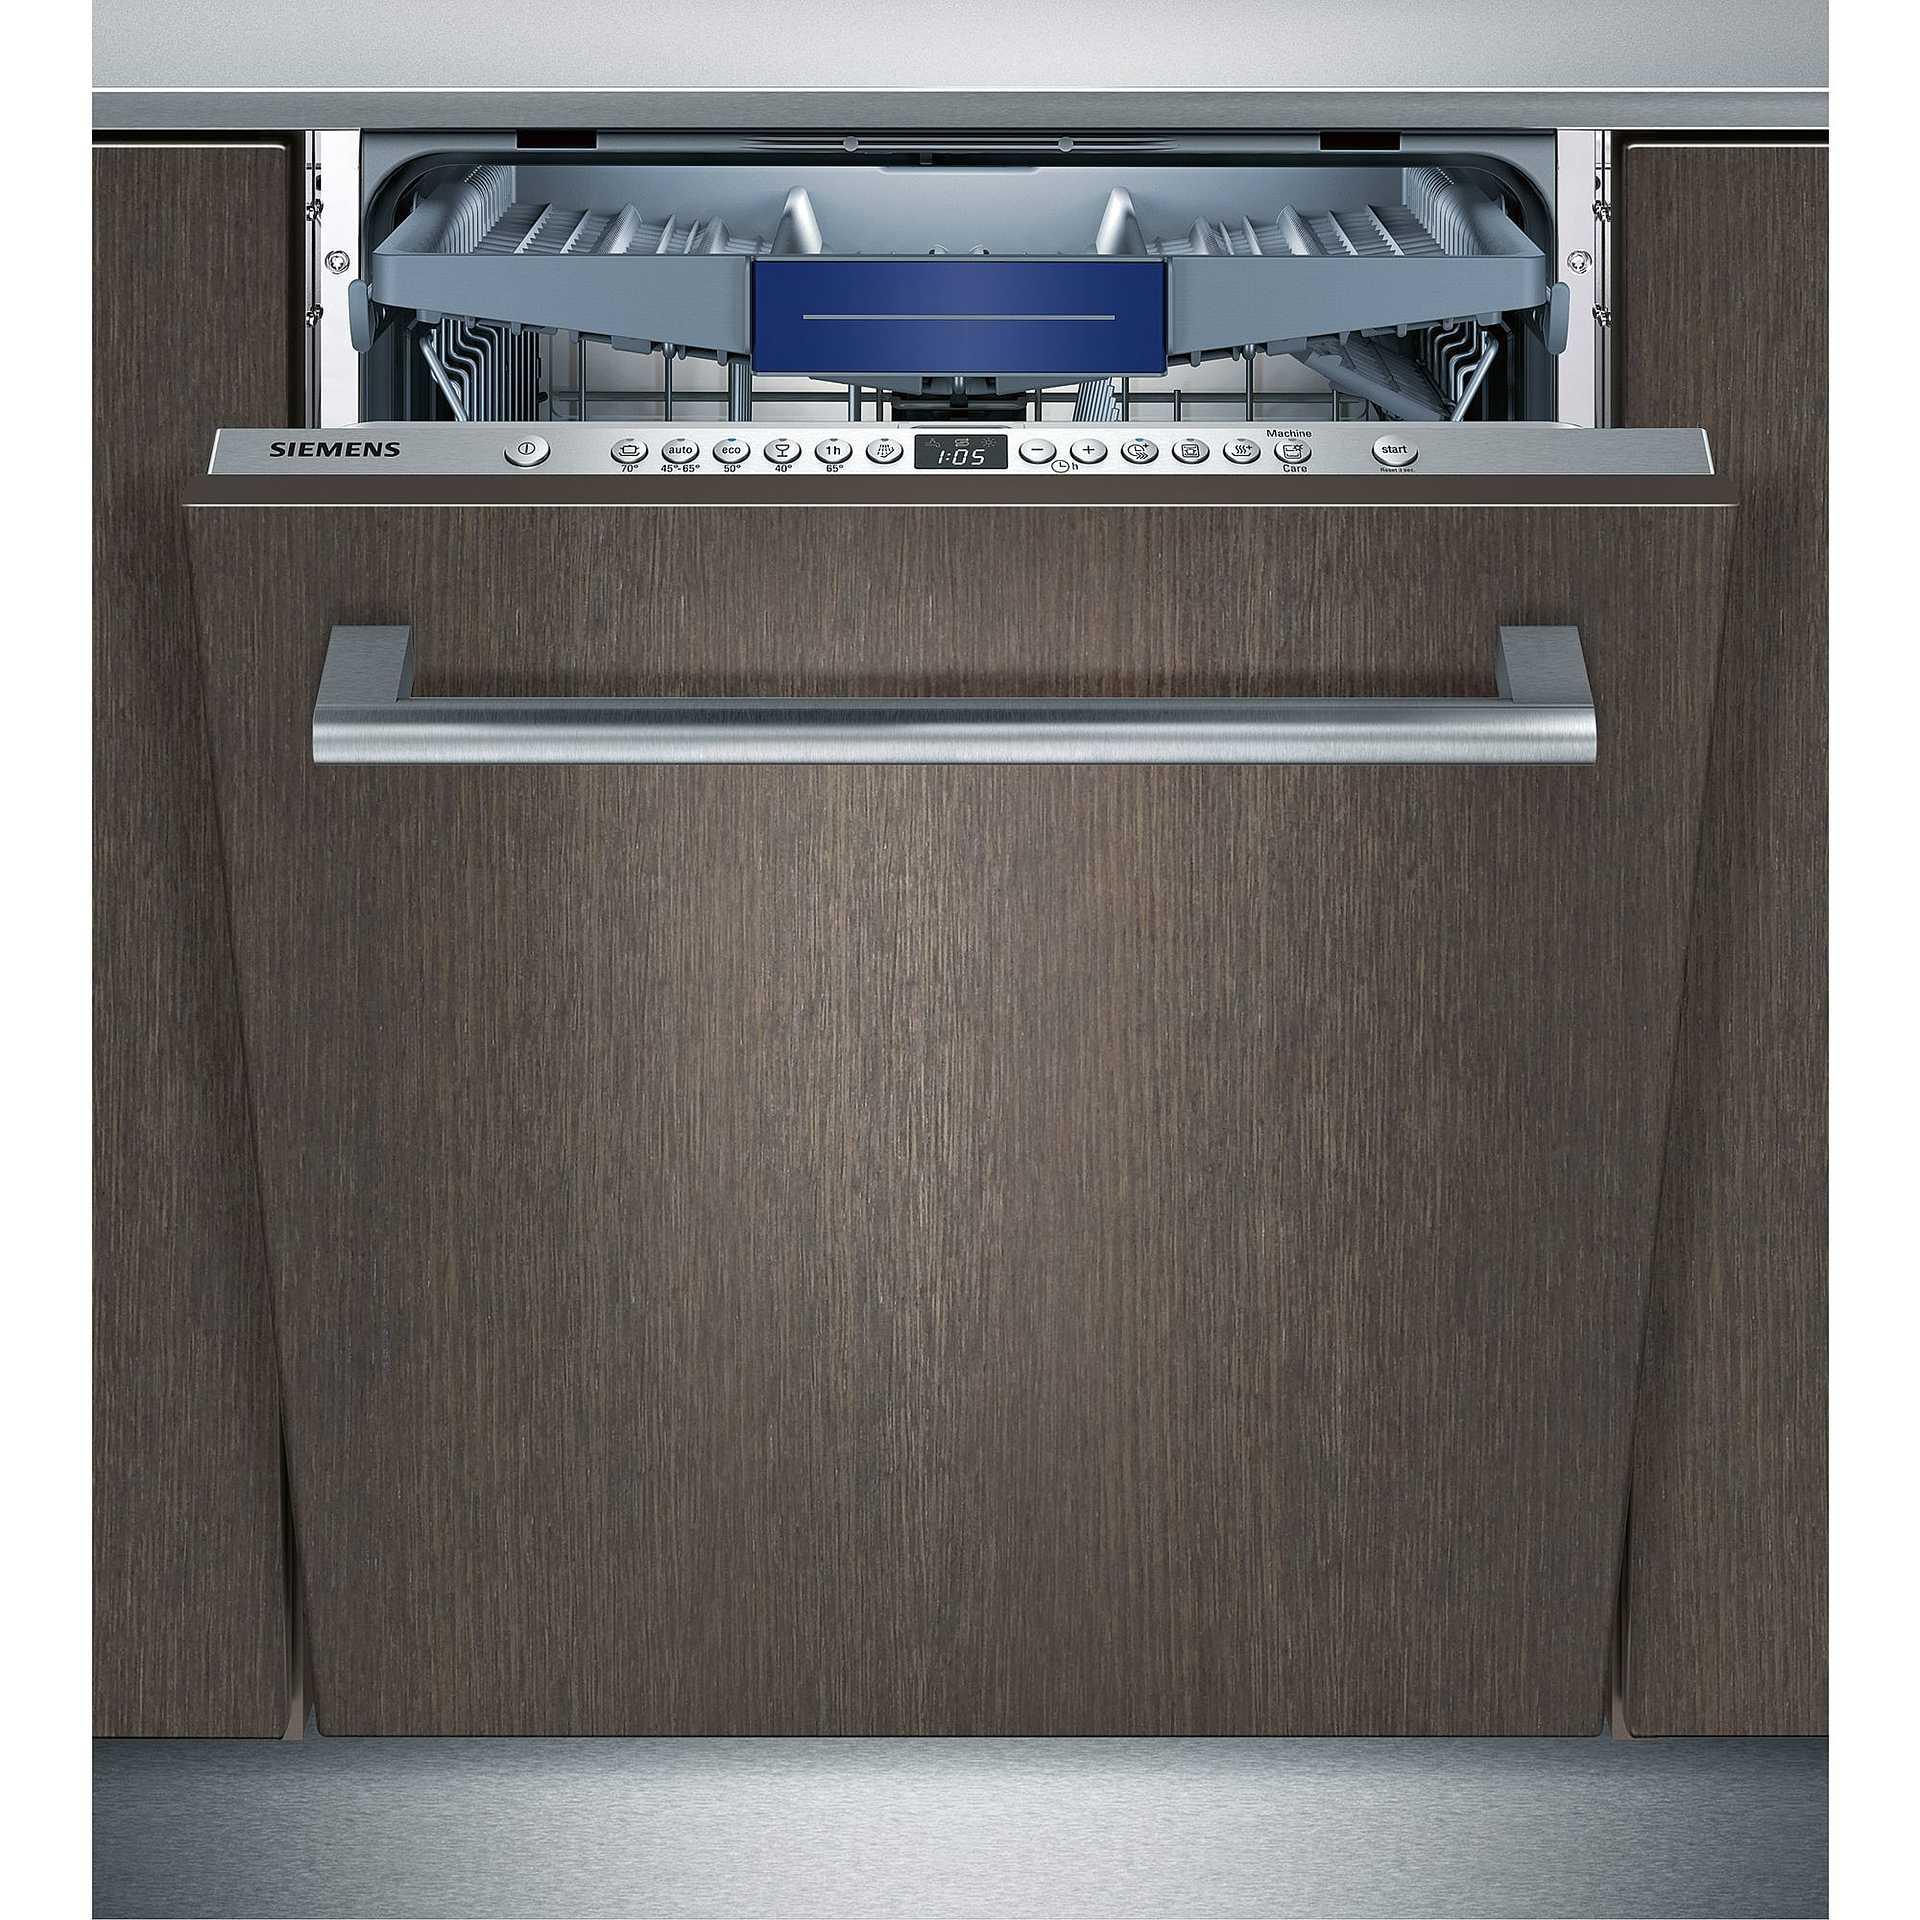 Siemens SN636X01KE lavastoviglie a scomparsa totale 13 coperti 6 ...